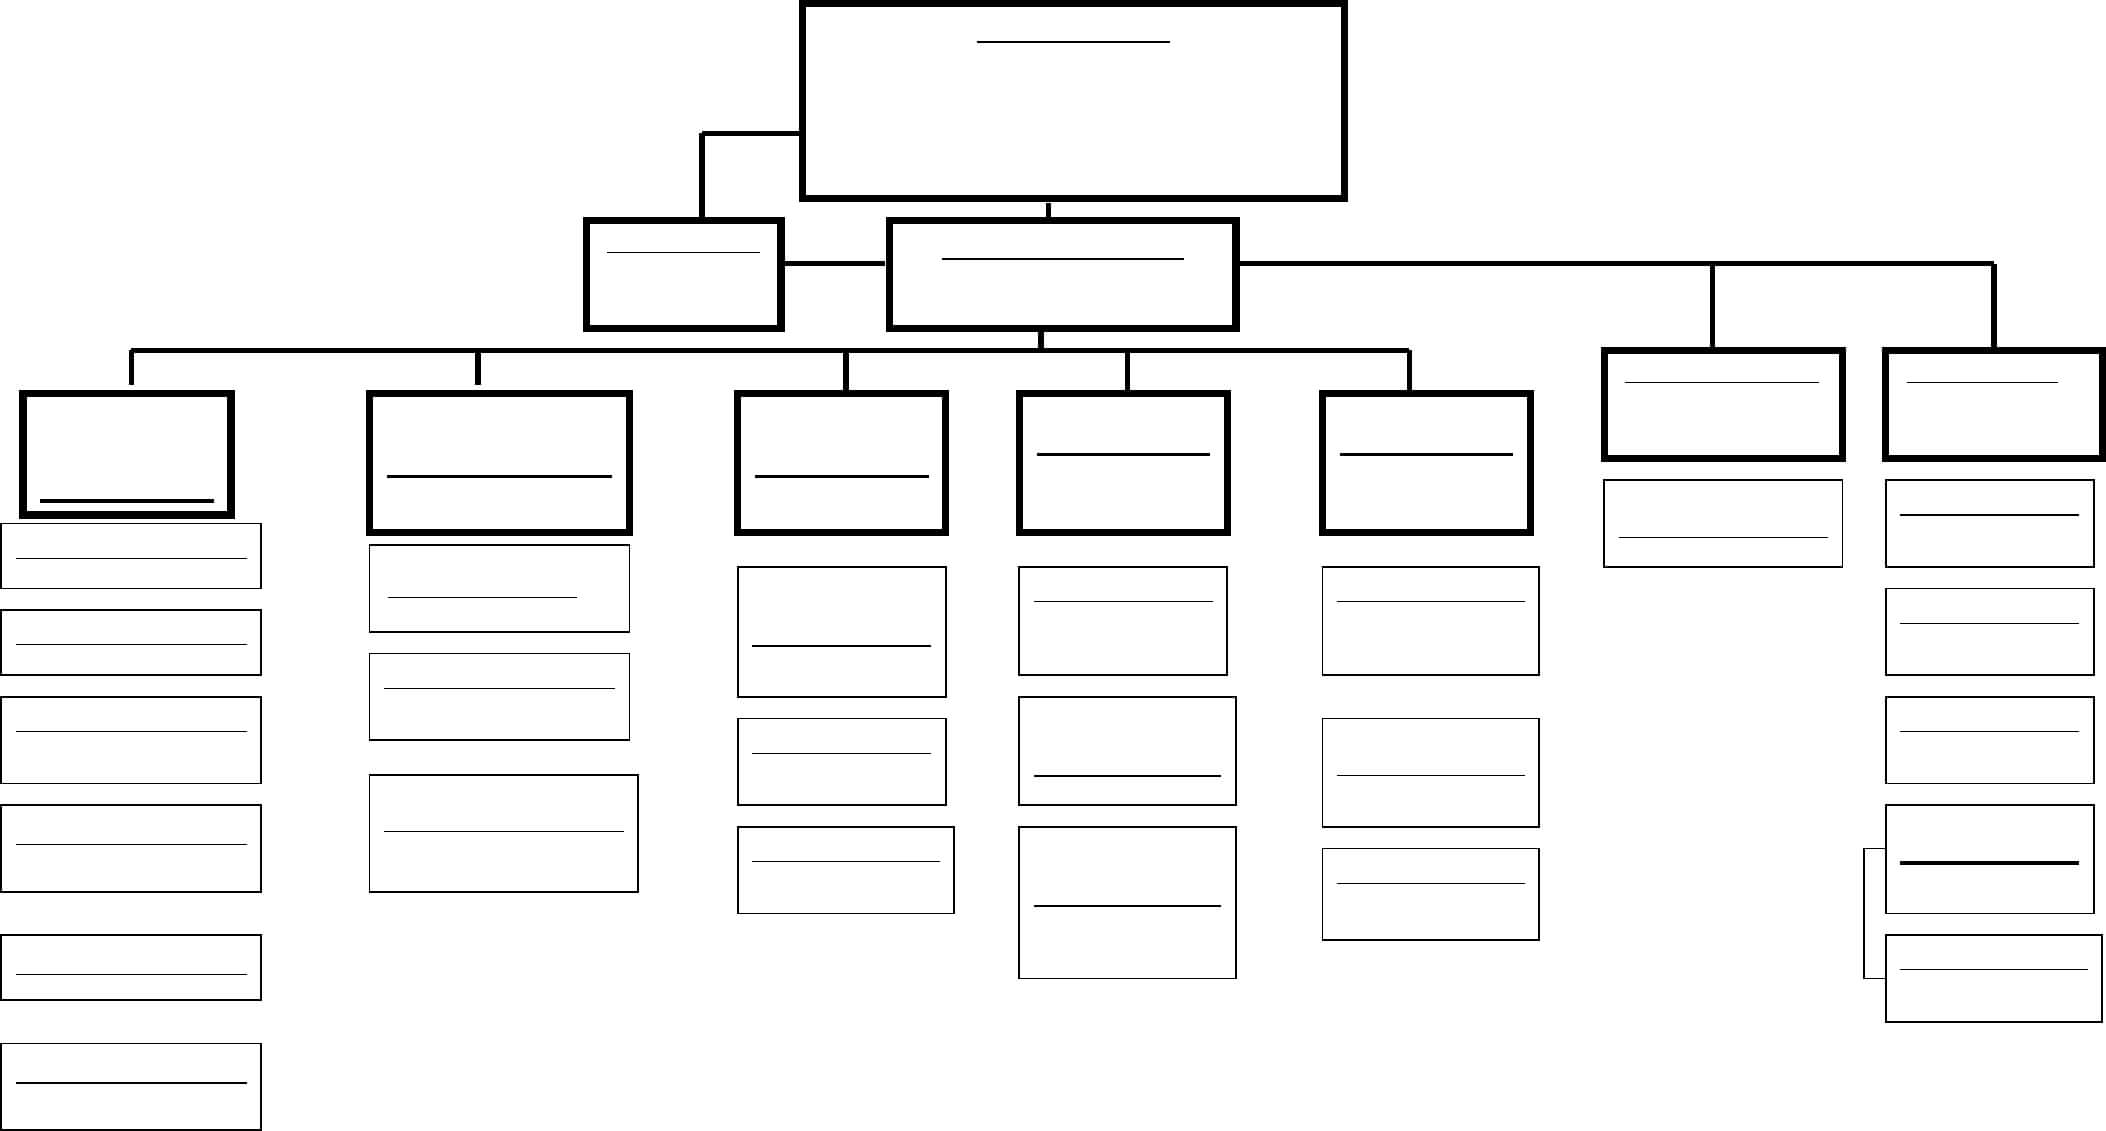 Blank Organizational Chart – Cumberland College Free Download Throughout Free Blank Organizational Chart Template